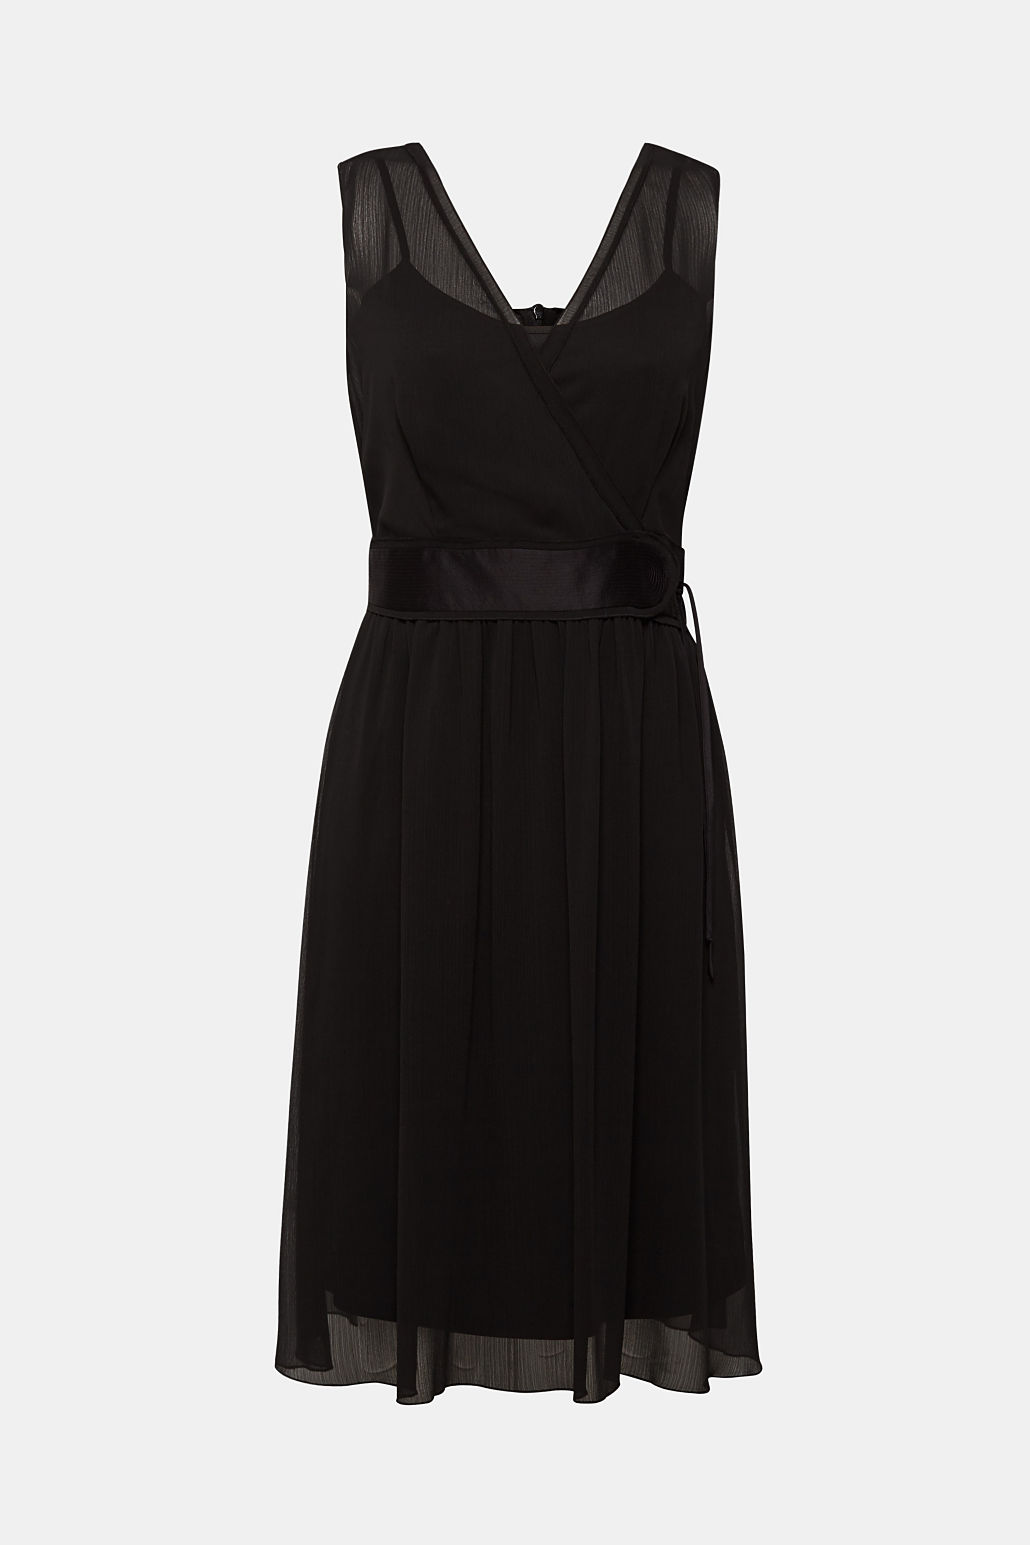 robe voile noire mariage